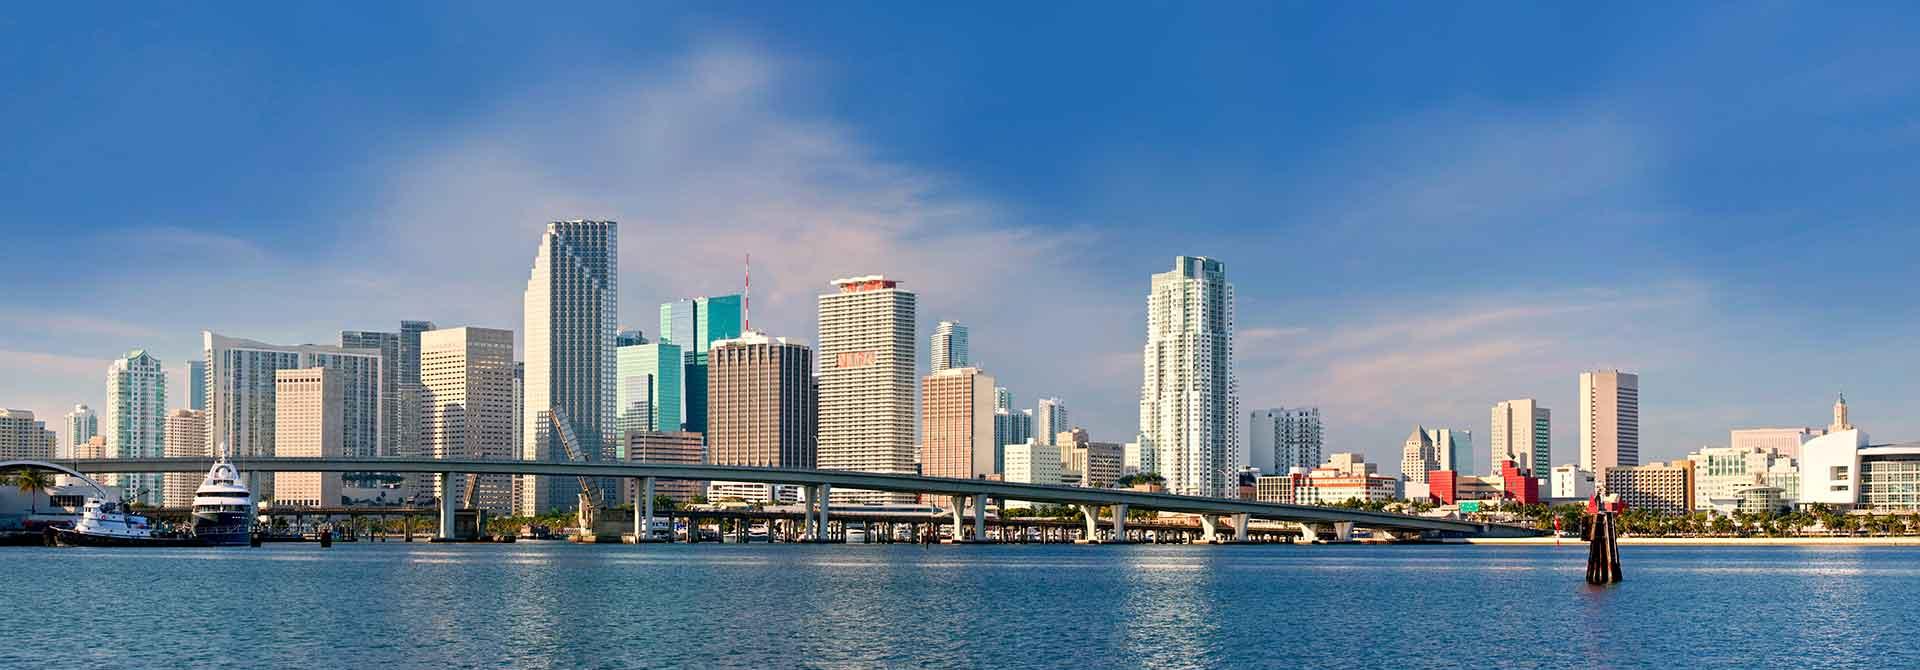 City skyline in Florida